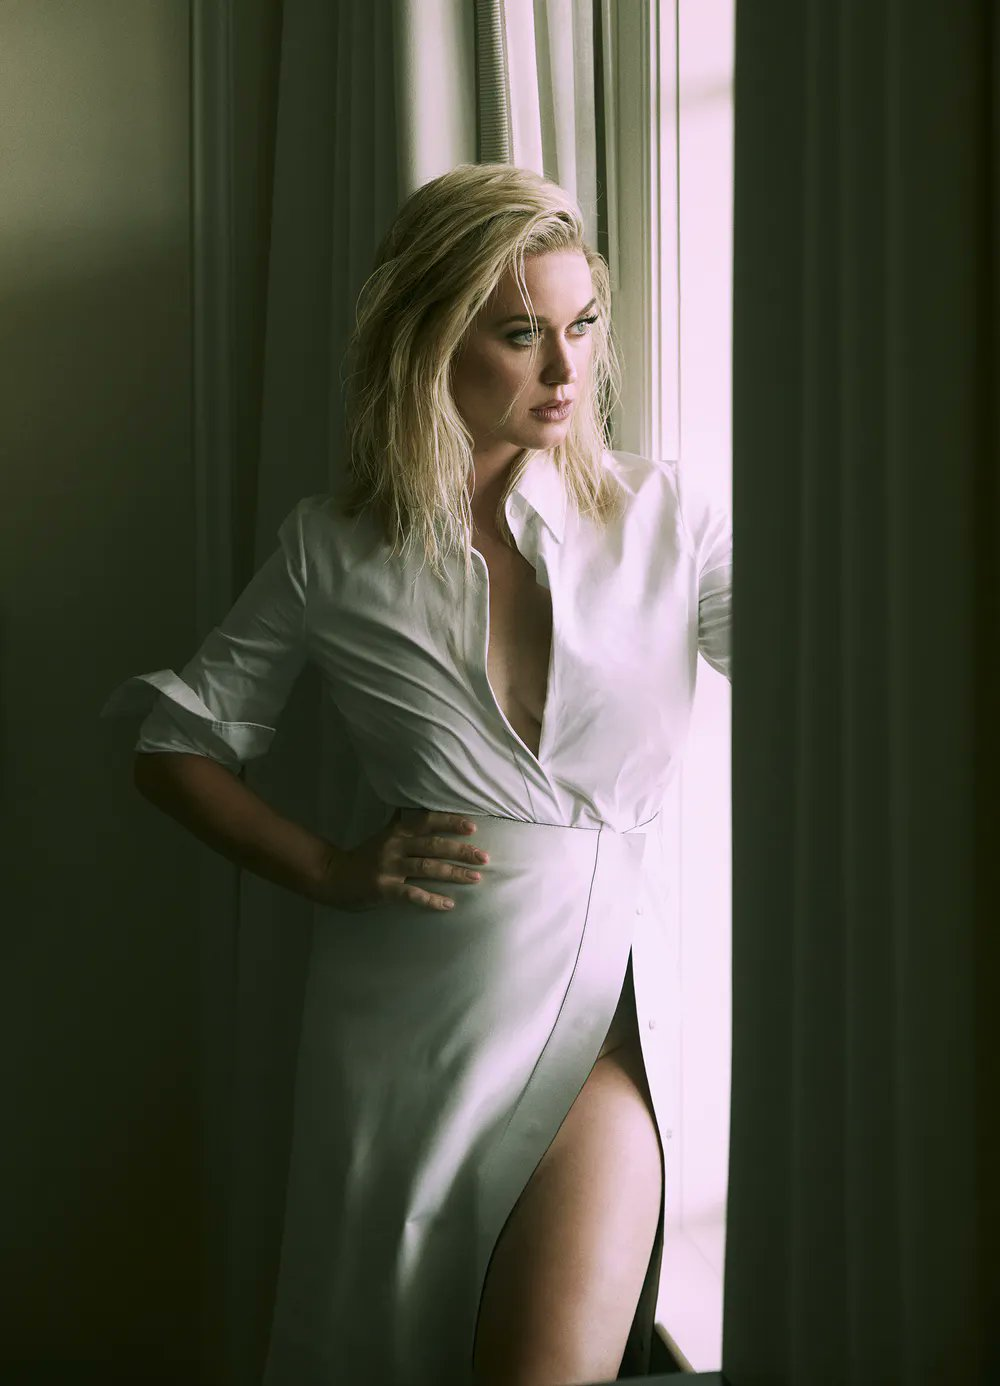 Katy Perry  - Σελίδα 44 E2zAHvAWQAAGVnW?format=jpg&name=large